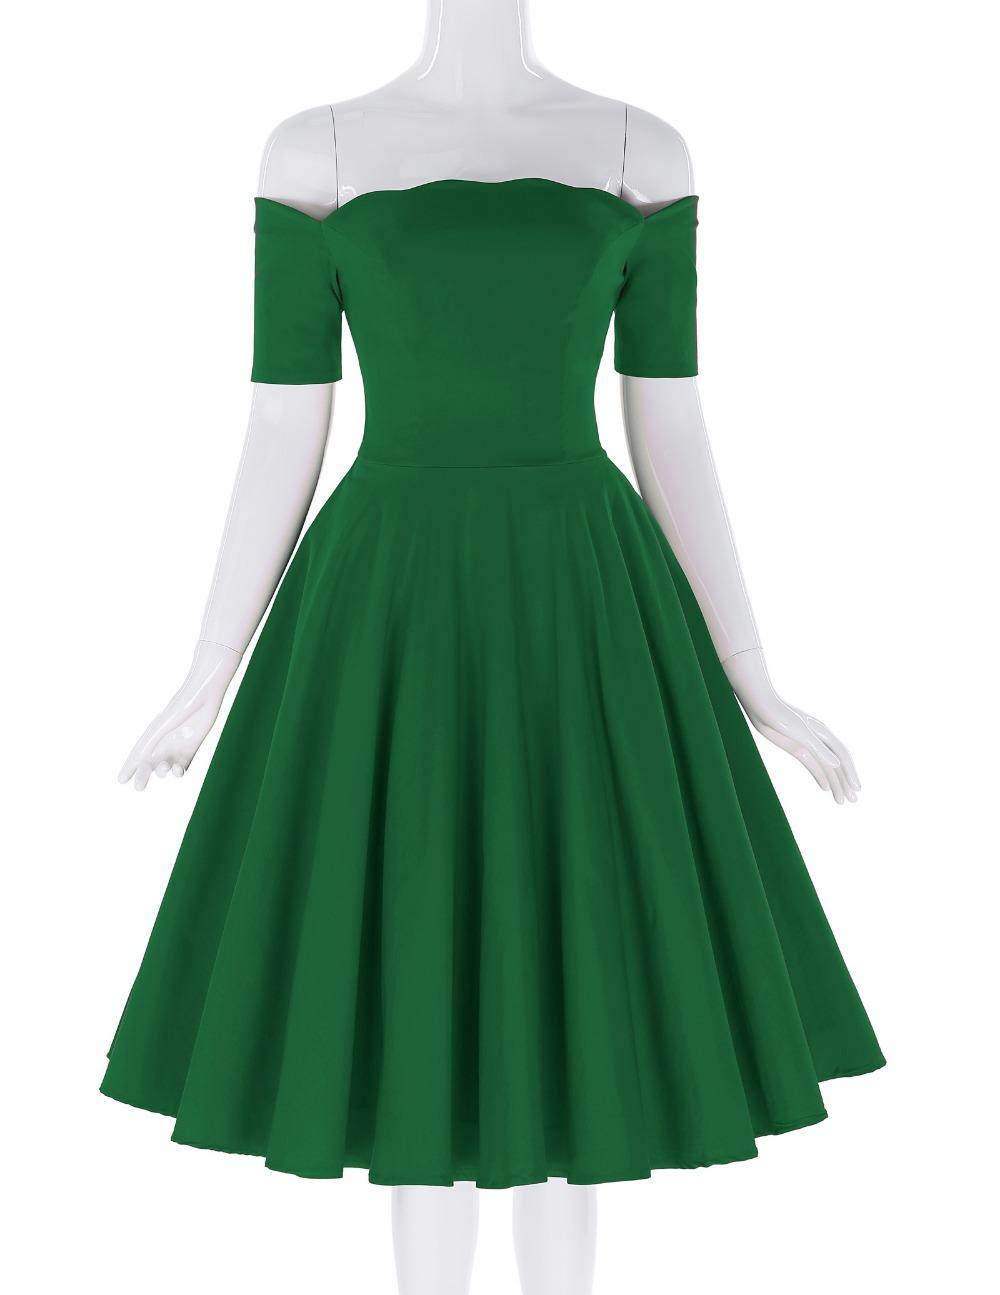 Belle Poque 17 Women Dress Robe Vintage Off Shoulder Black Summer Dress Jurken 1950s 60s Retro Rockabilly Swing Party Dresses 21